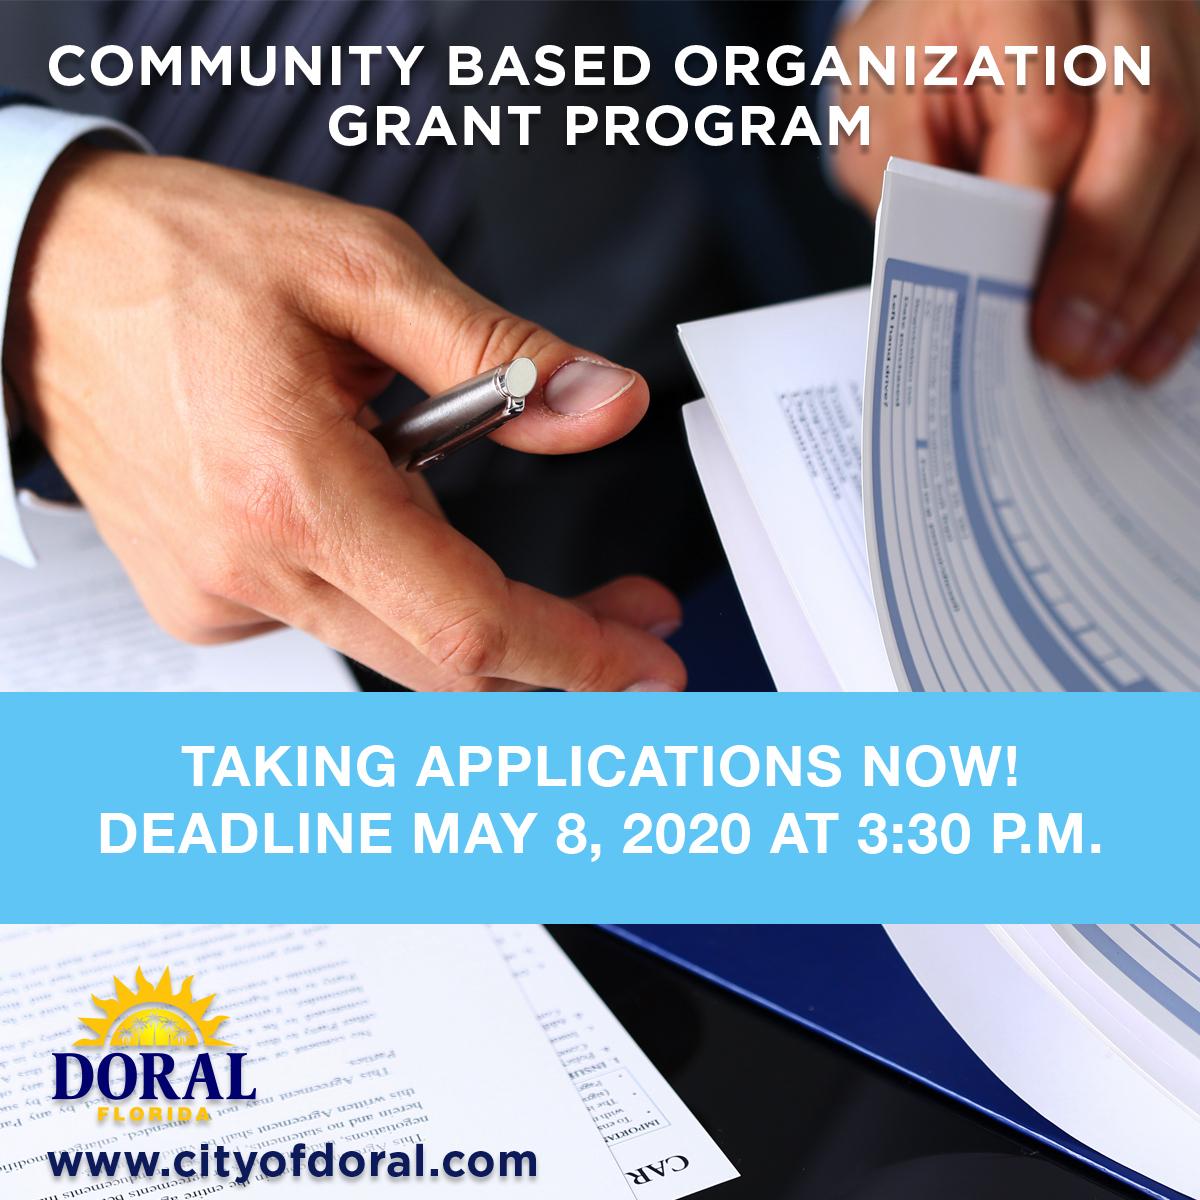 Community Based Organization Grant